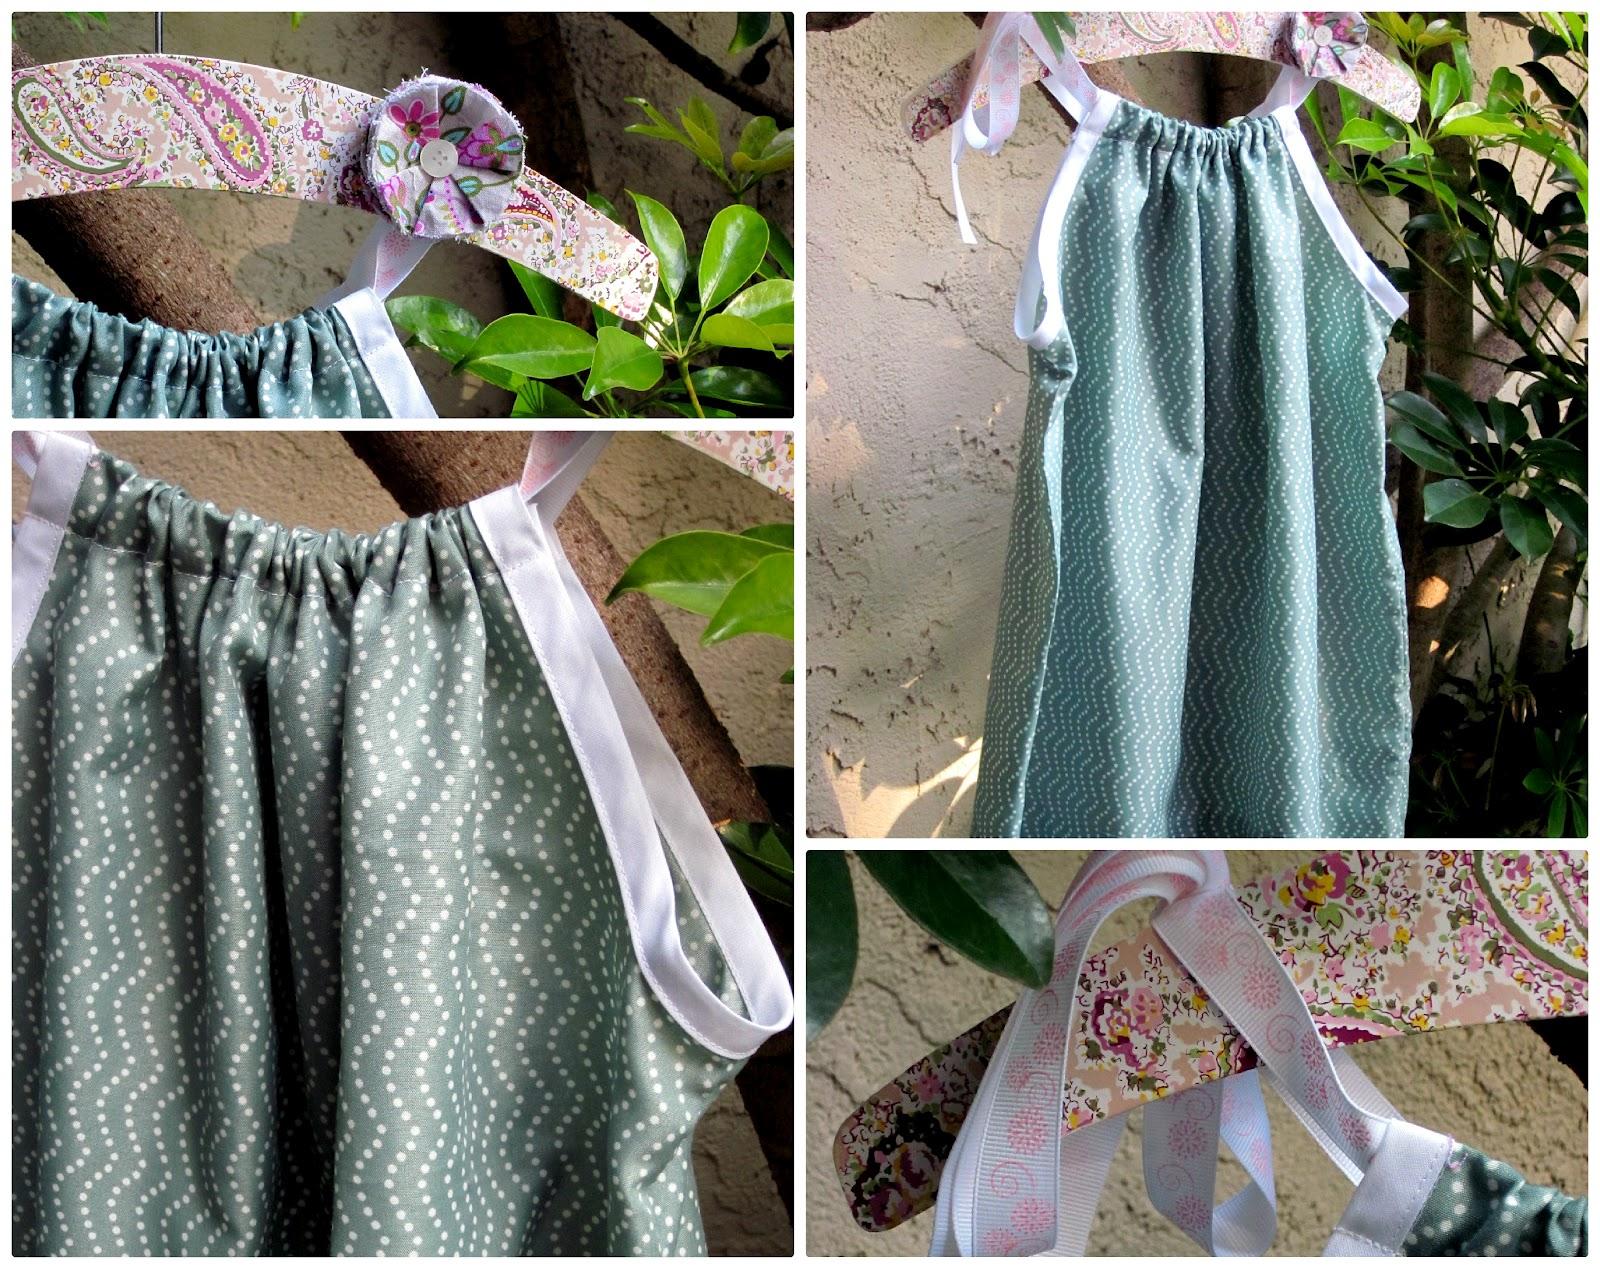 Easy DIY Pillowcase Dress with coordinating grey/pink/teal fabric flower clip & Mejia Mamma: EASY Pillowcase Dress pillowsntoast.com